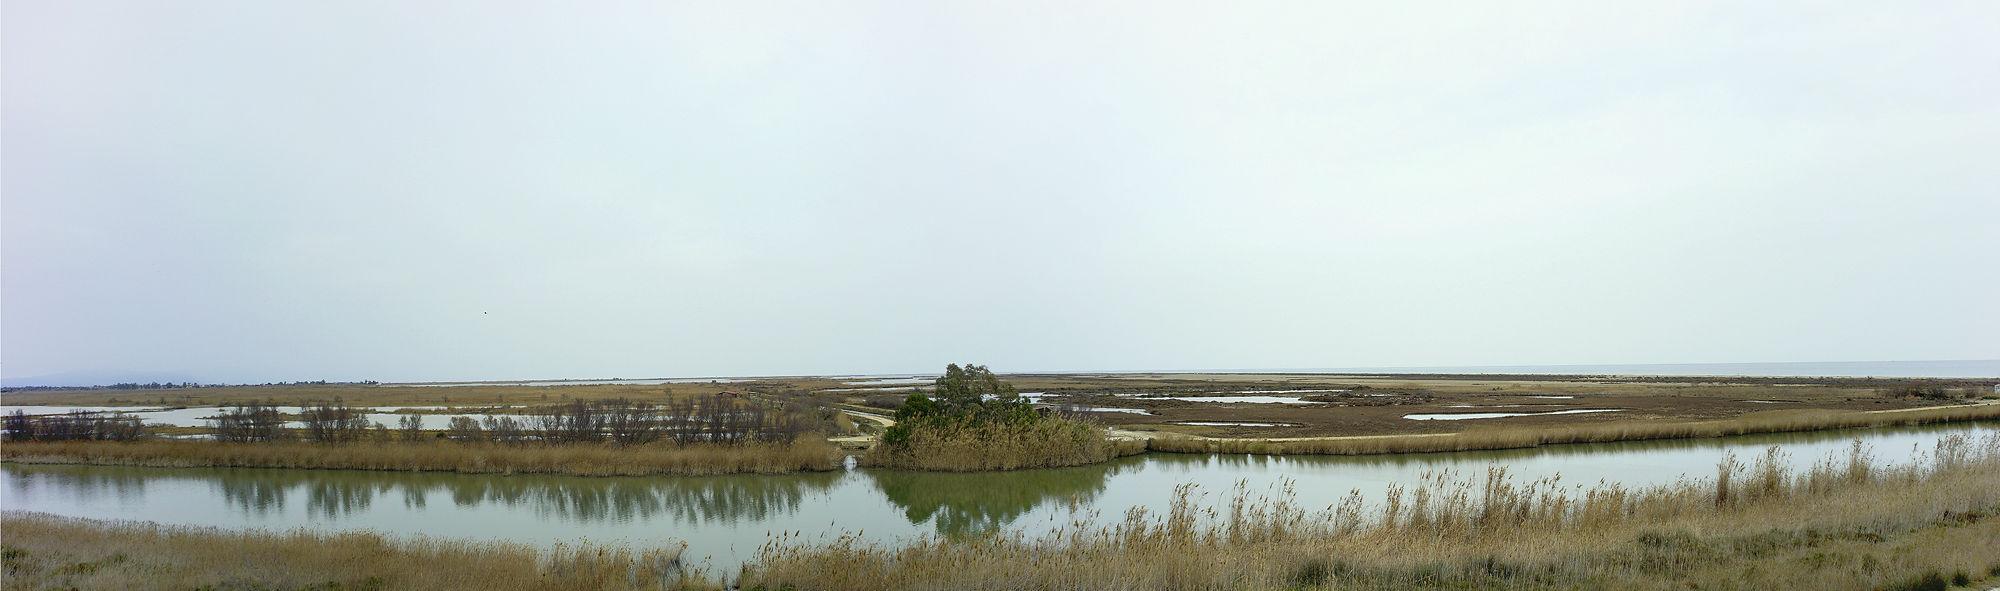 Naturpark Ebro-Delta ~ Blick über den Riu Migjorn auf die Illa de Buda